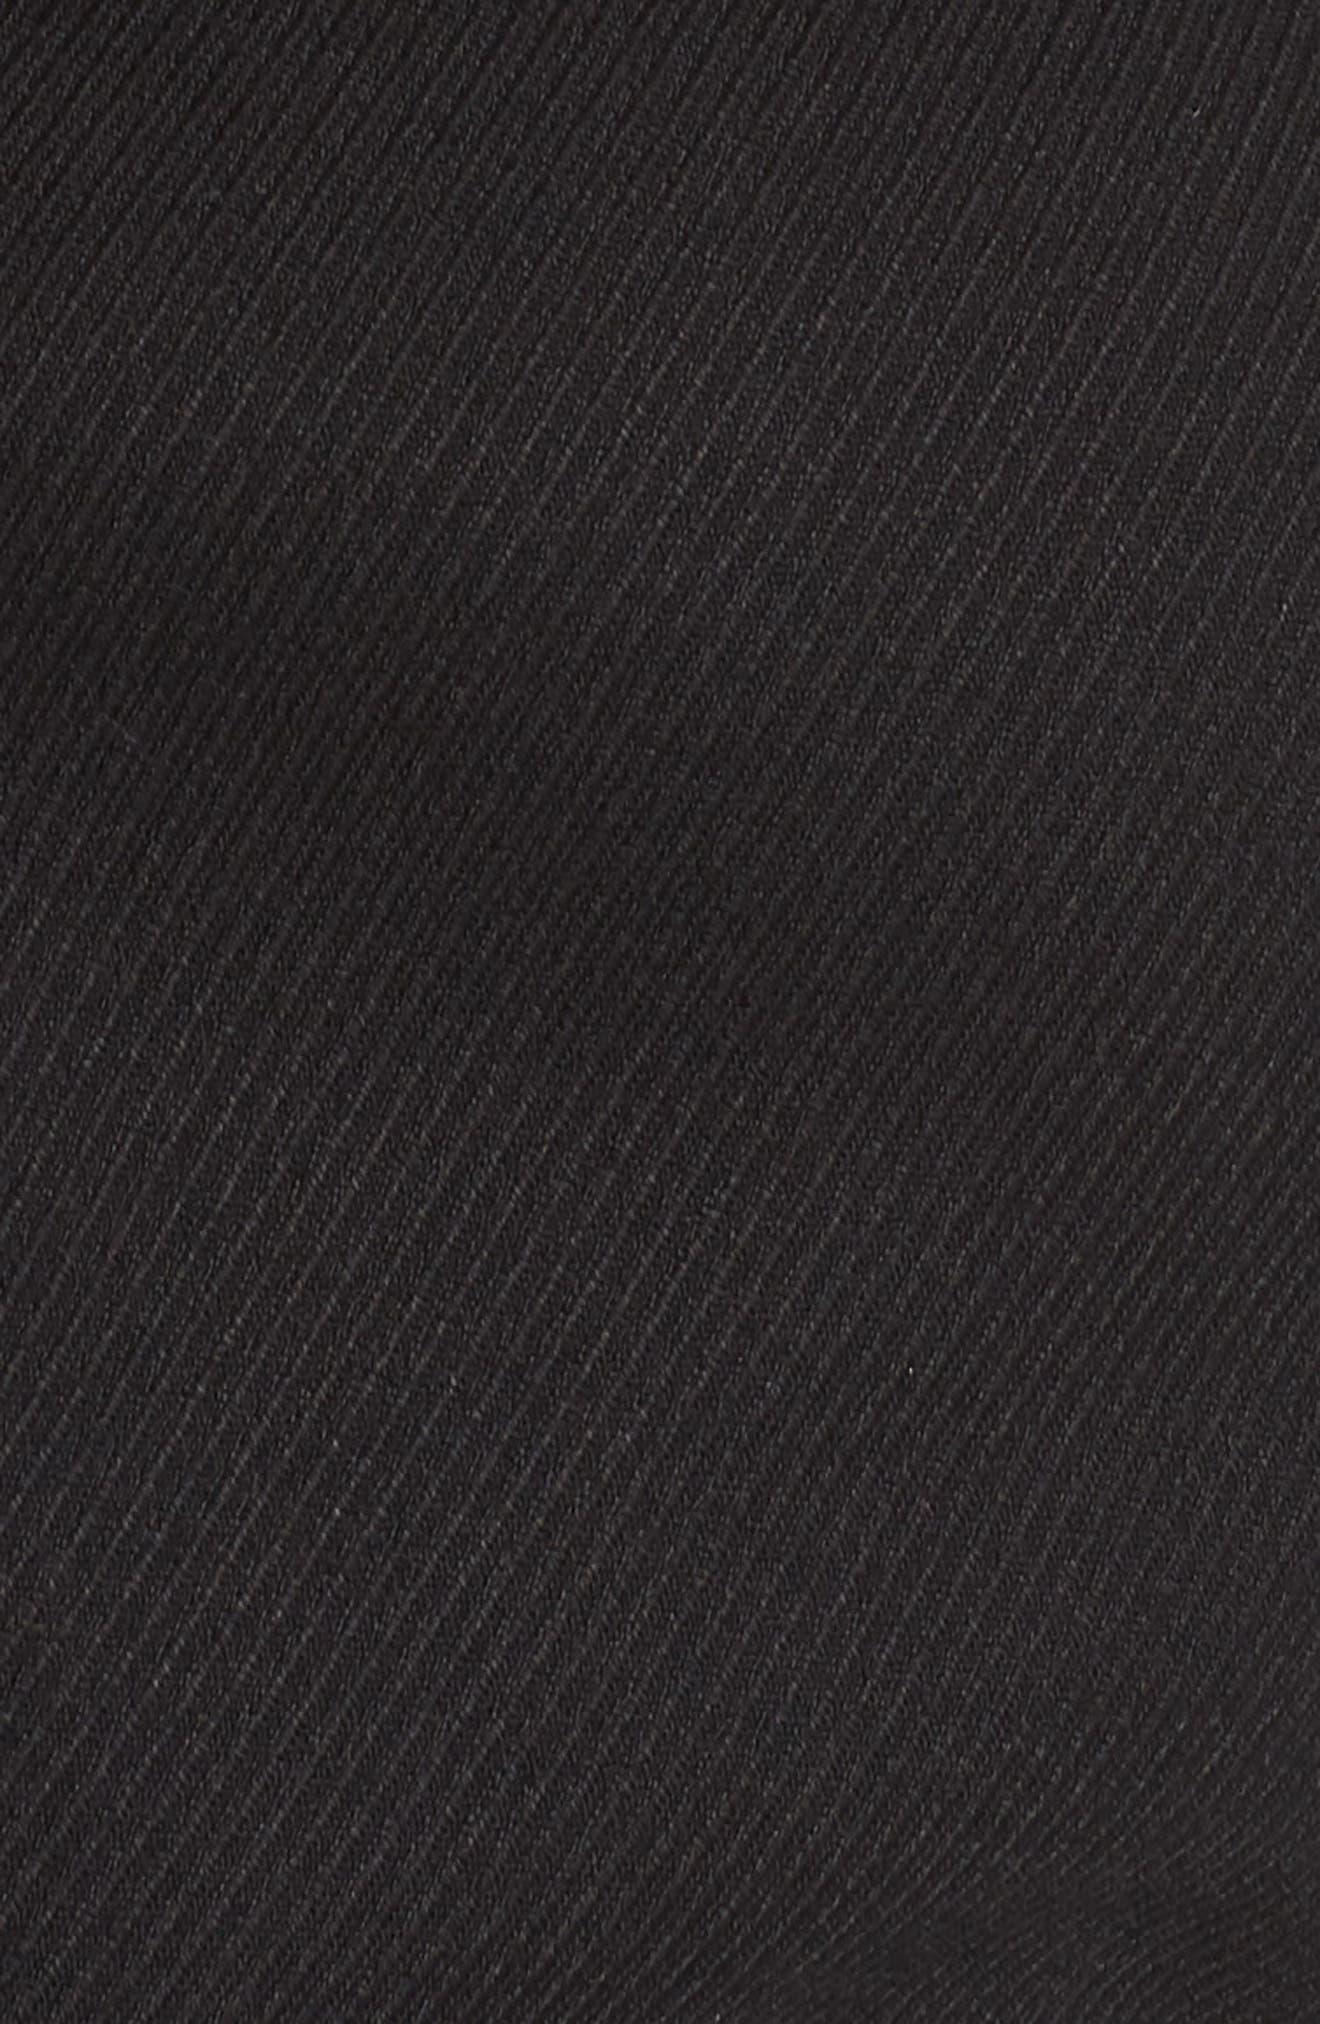 SEJOUR, Peplum Jacket, Alternate thumbnail 7, color, BLACK